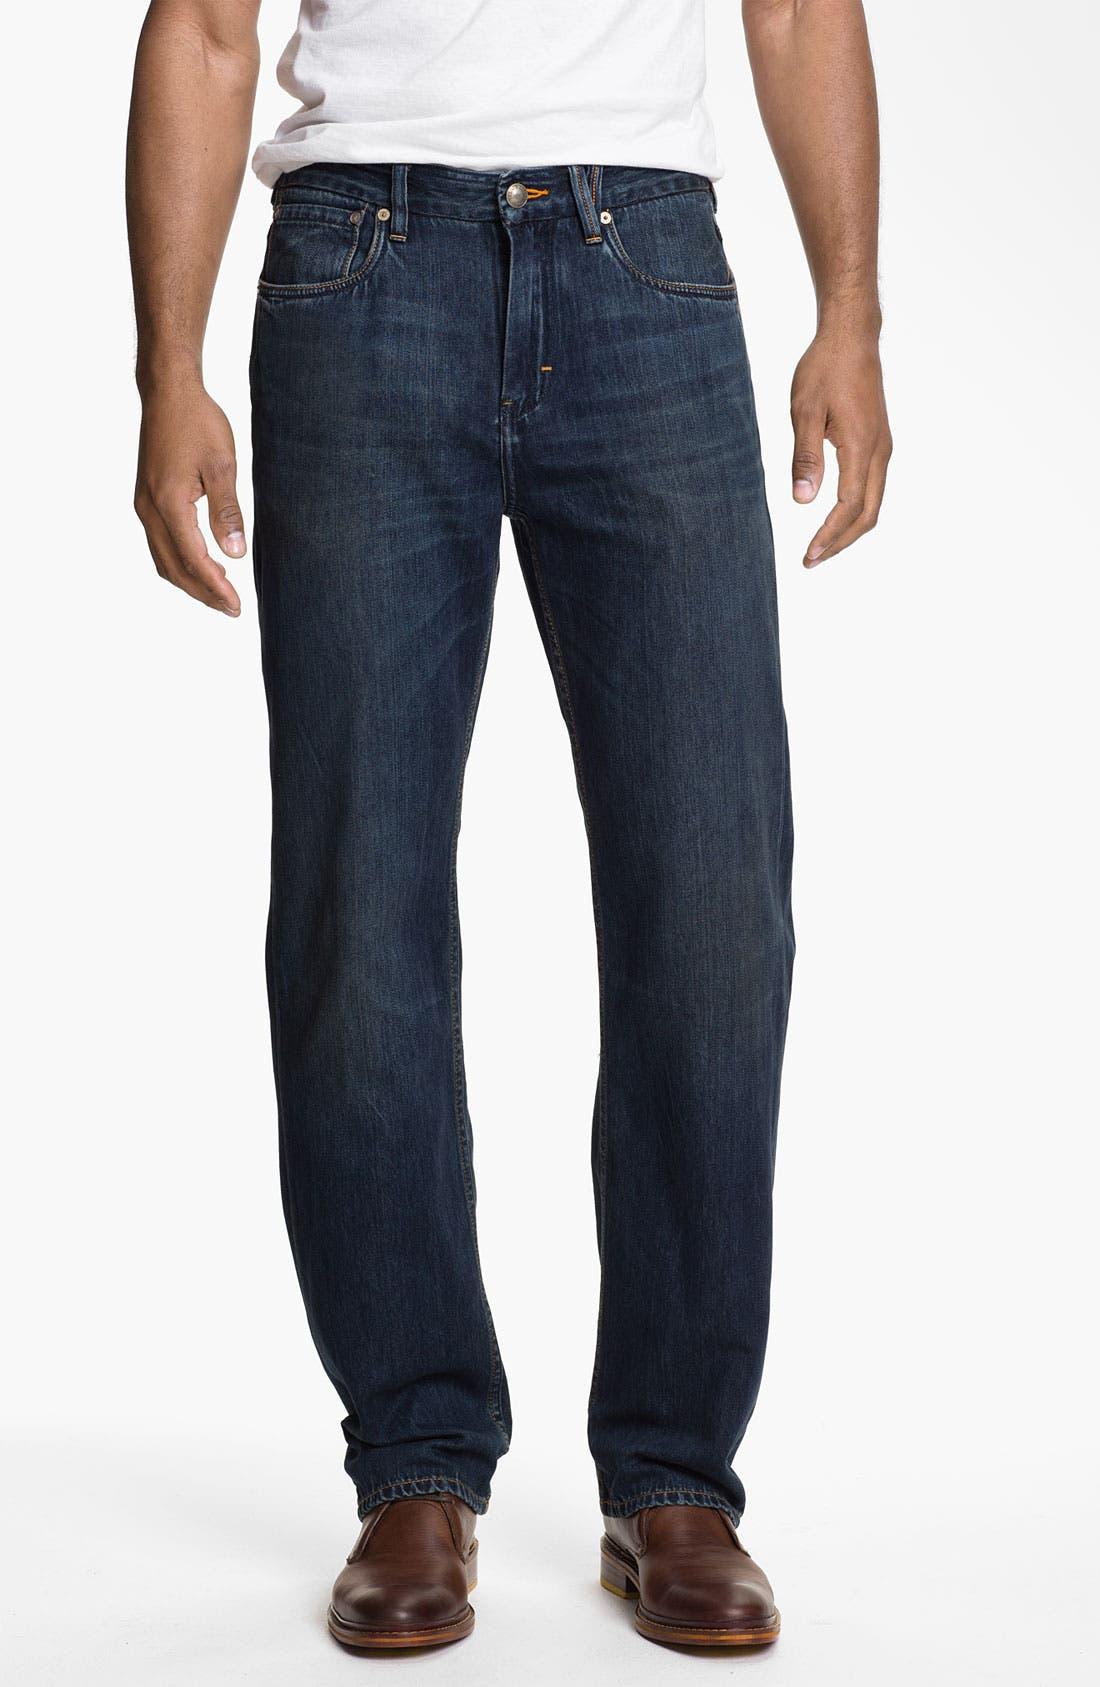 Alternate Image 1 Selected - Tommy Bahama Denim 'Coastal Island Ease' Straight Leg Jeans (Dark Storm) (Big & Tall)